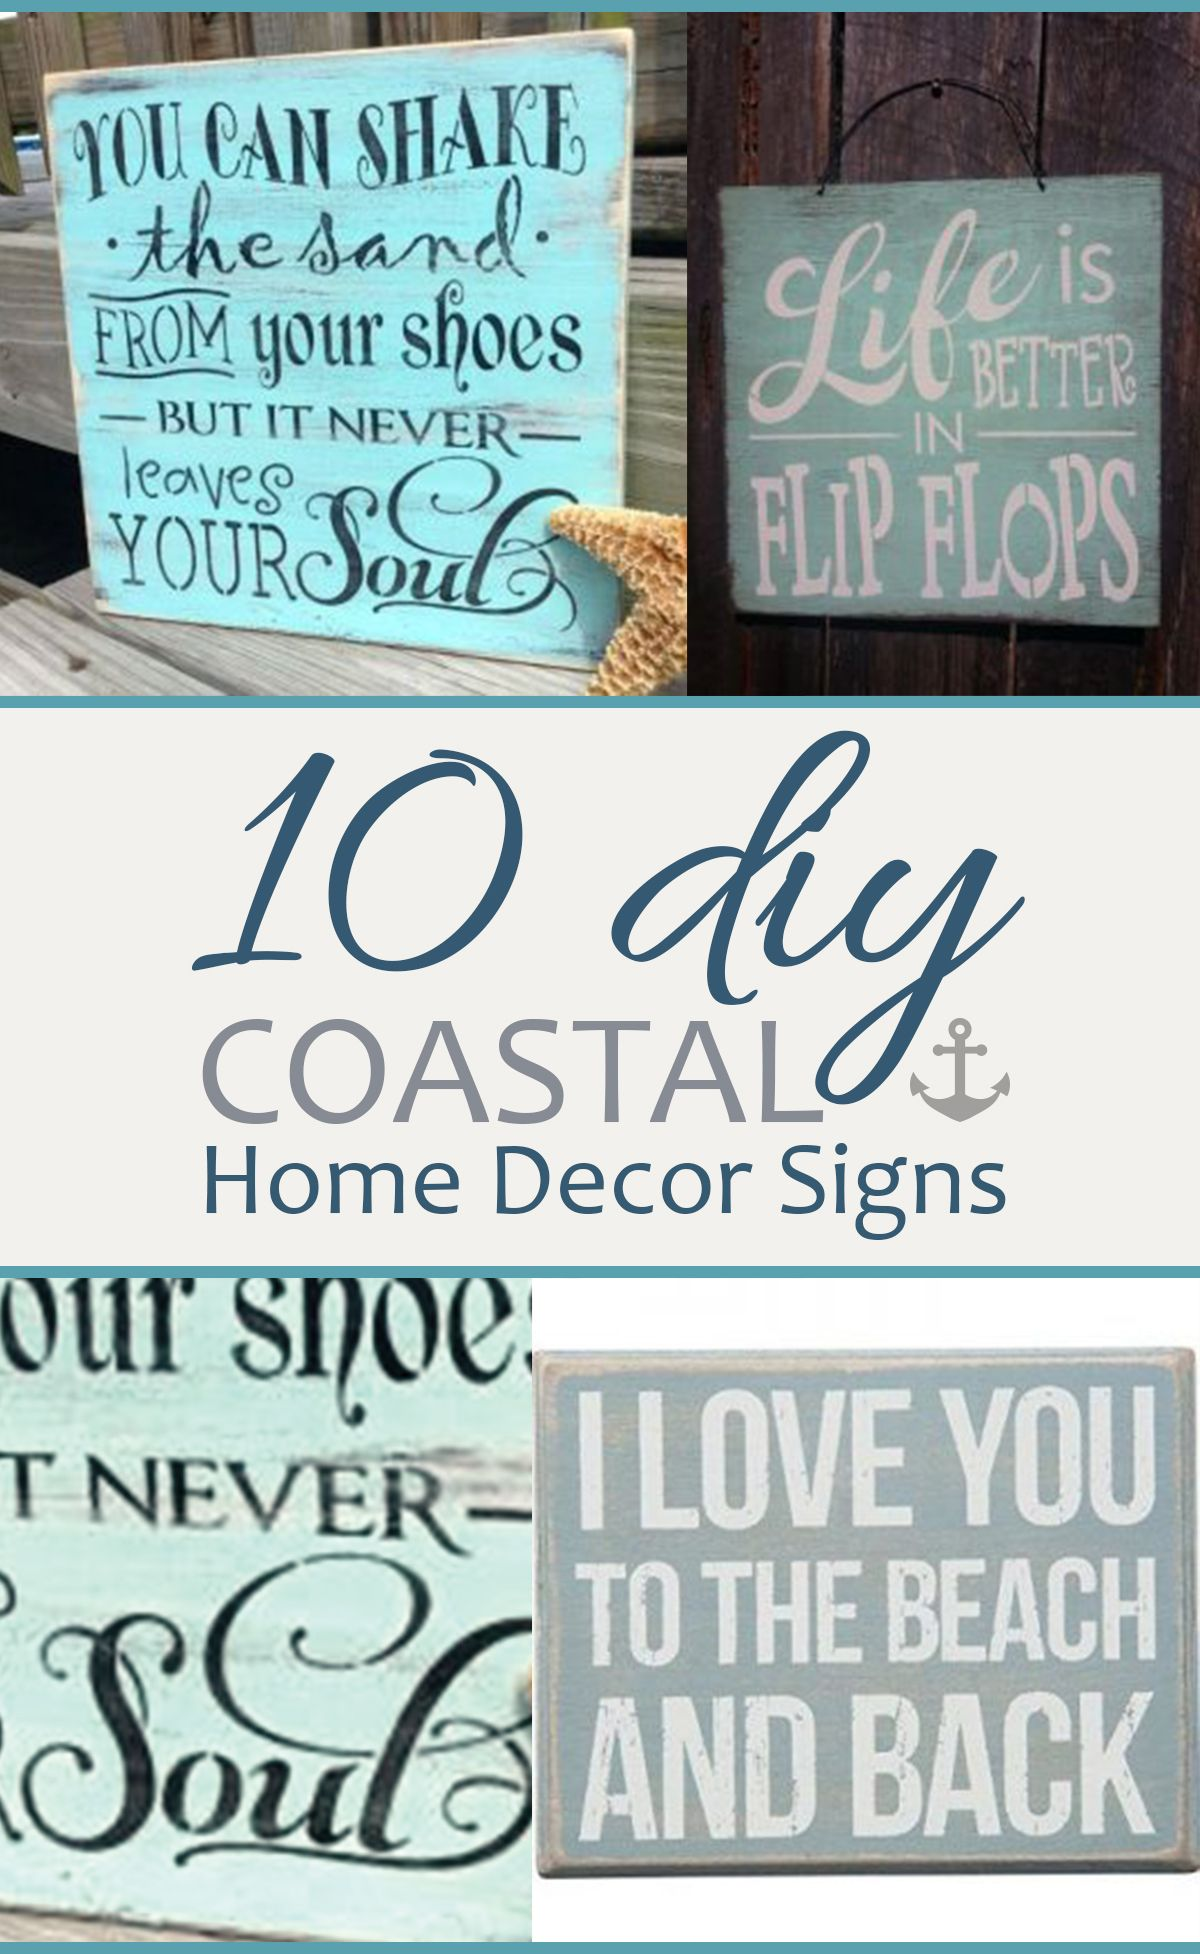 10 Diy Coastal Home Decor Signs Home Decor Signs Coastal Decor